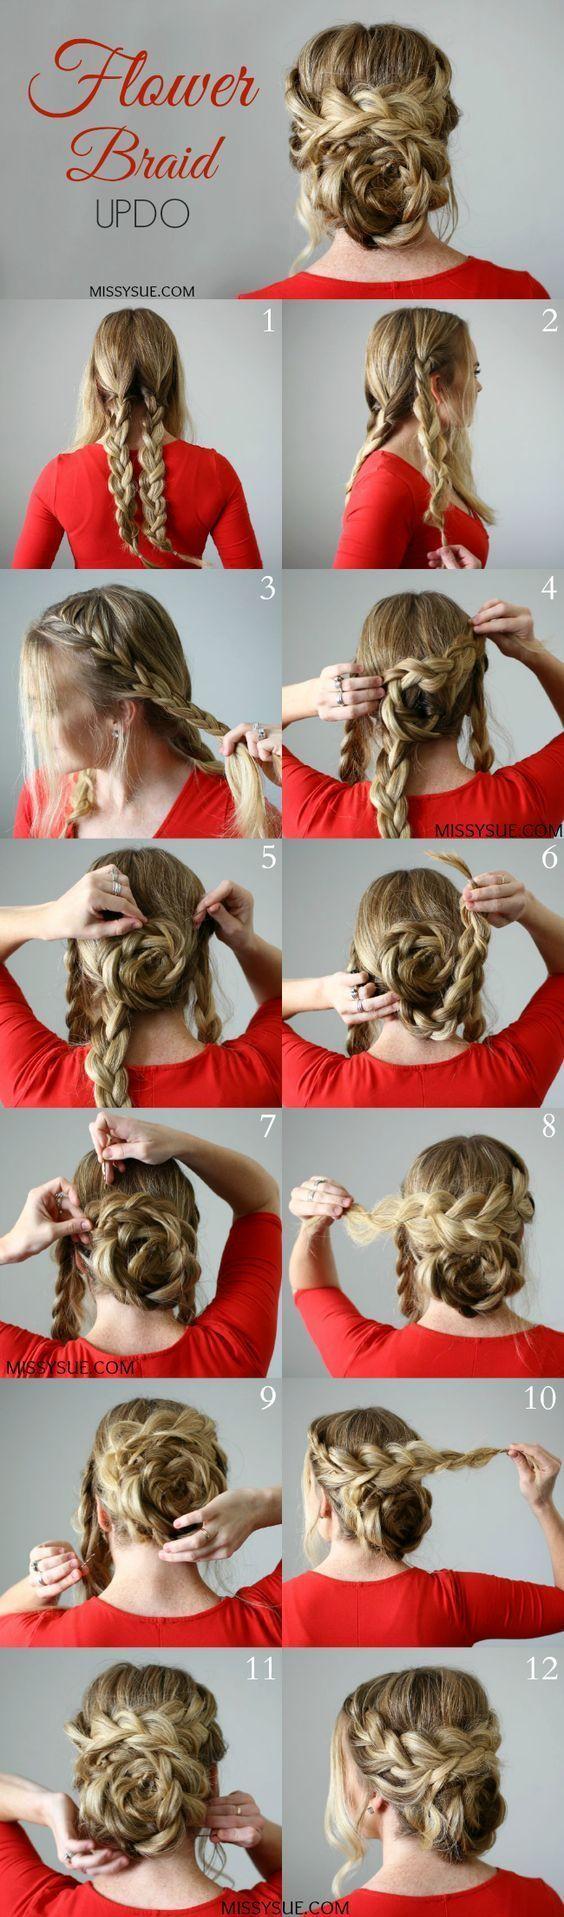 Flower Braid Updo Tutorial / http://www.himisspuff.com/easy-diy-braided-hairstyles-tutorials/79/: